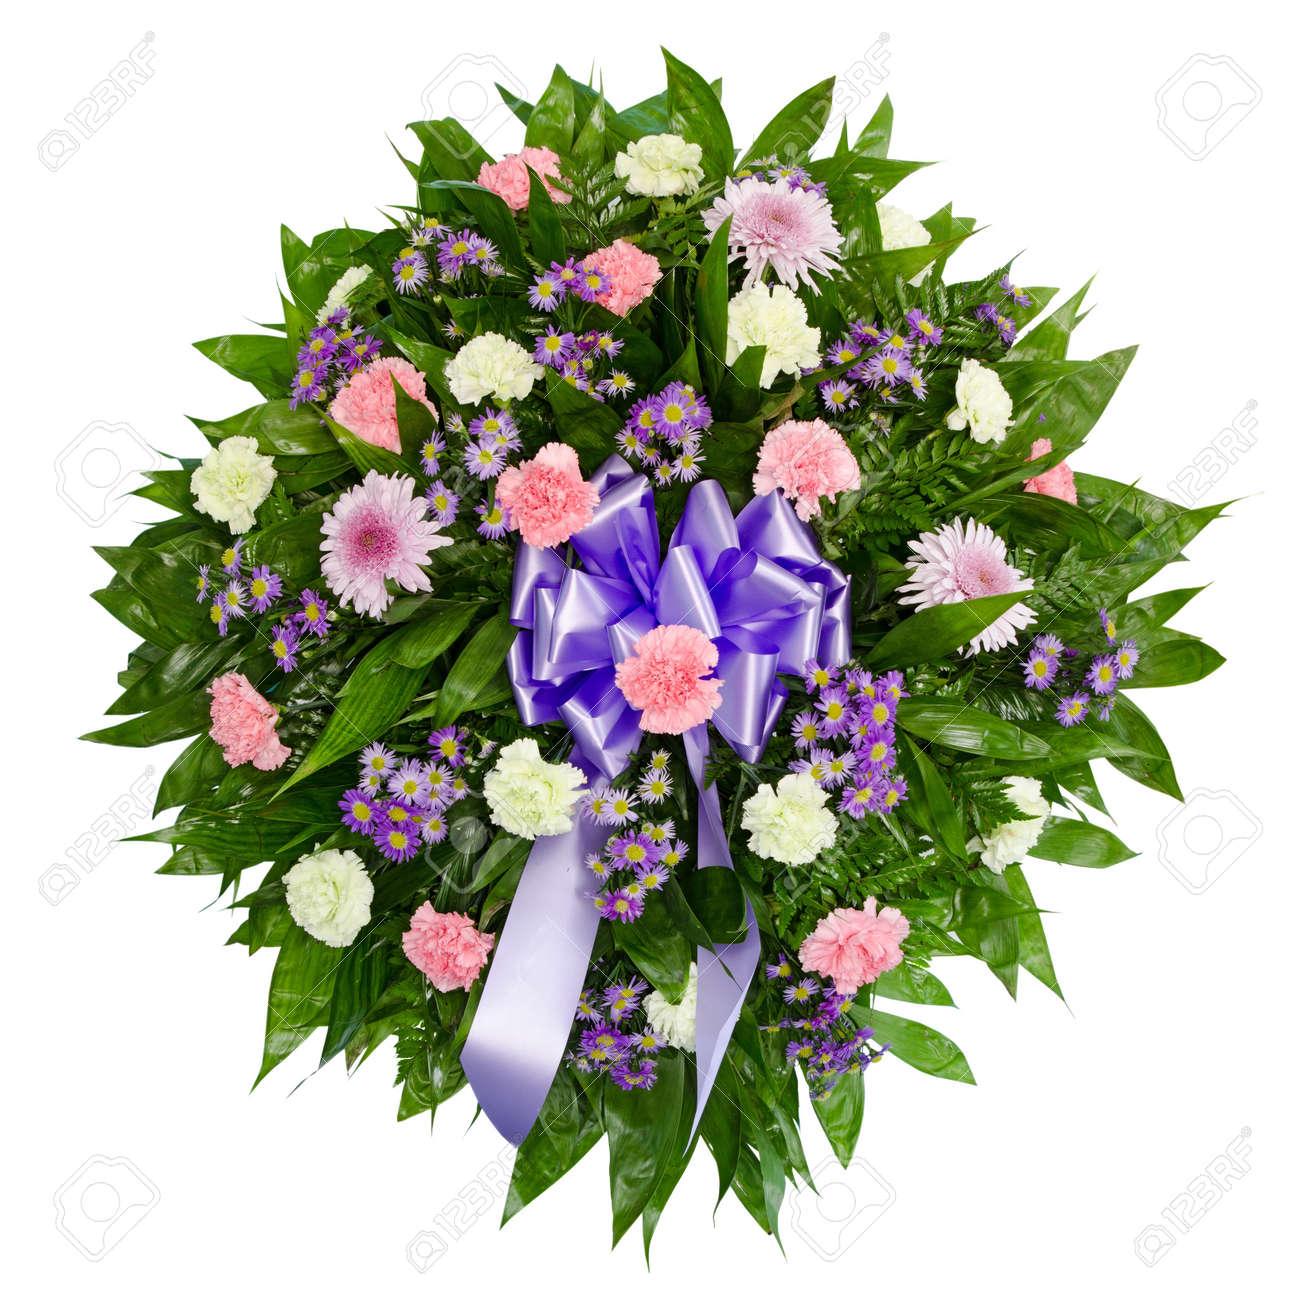 Colorful flower arrangement wreath for funerals isolated on white colorful flower arrangement wreath for funerals isolated on white stock photo 10413691 izmirmasajfo